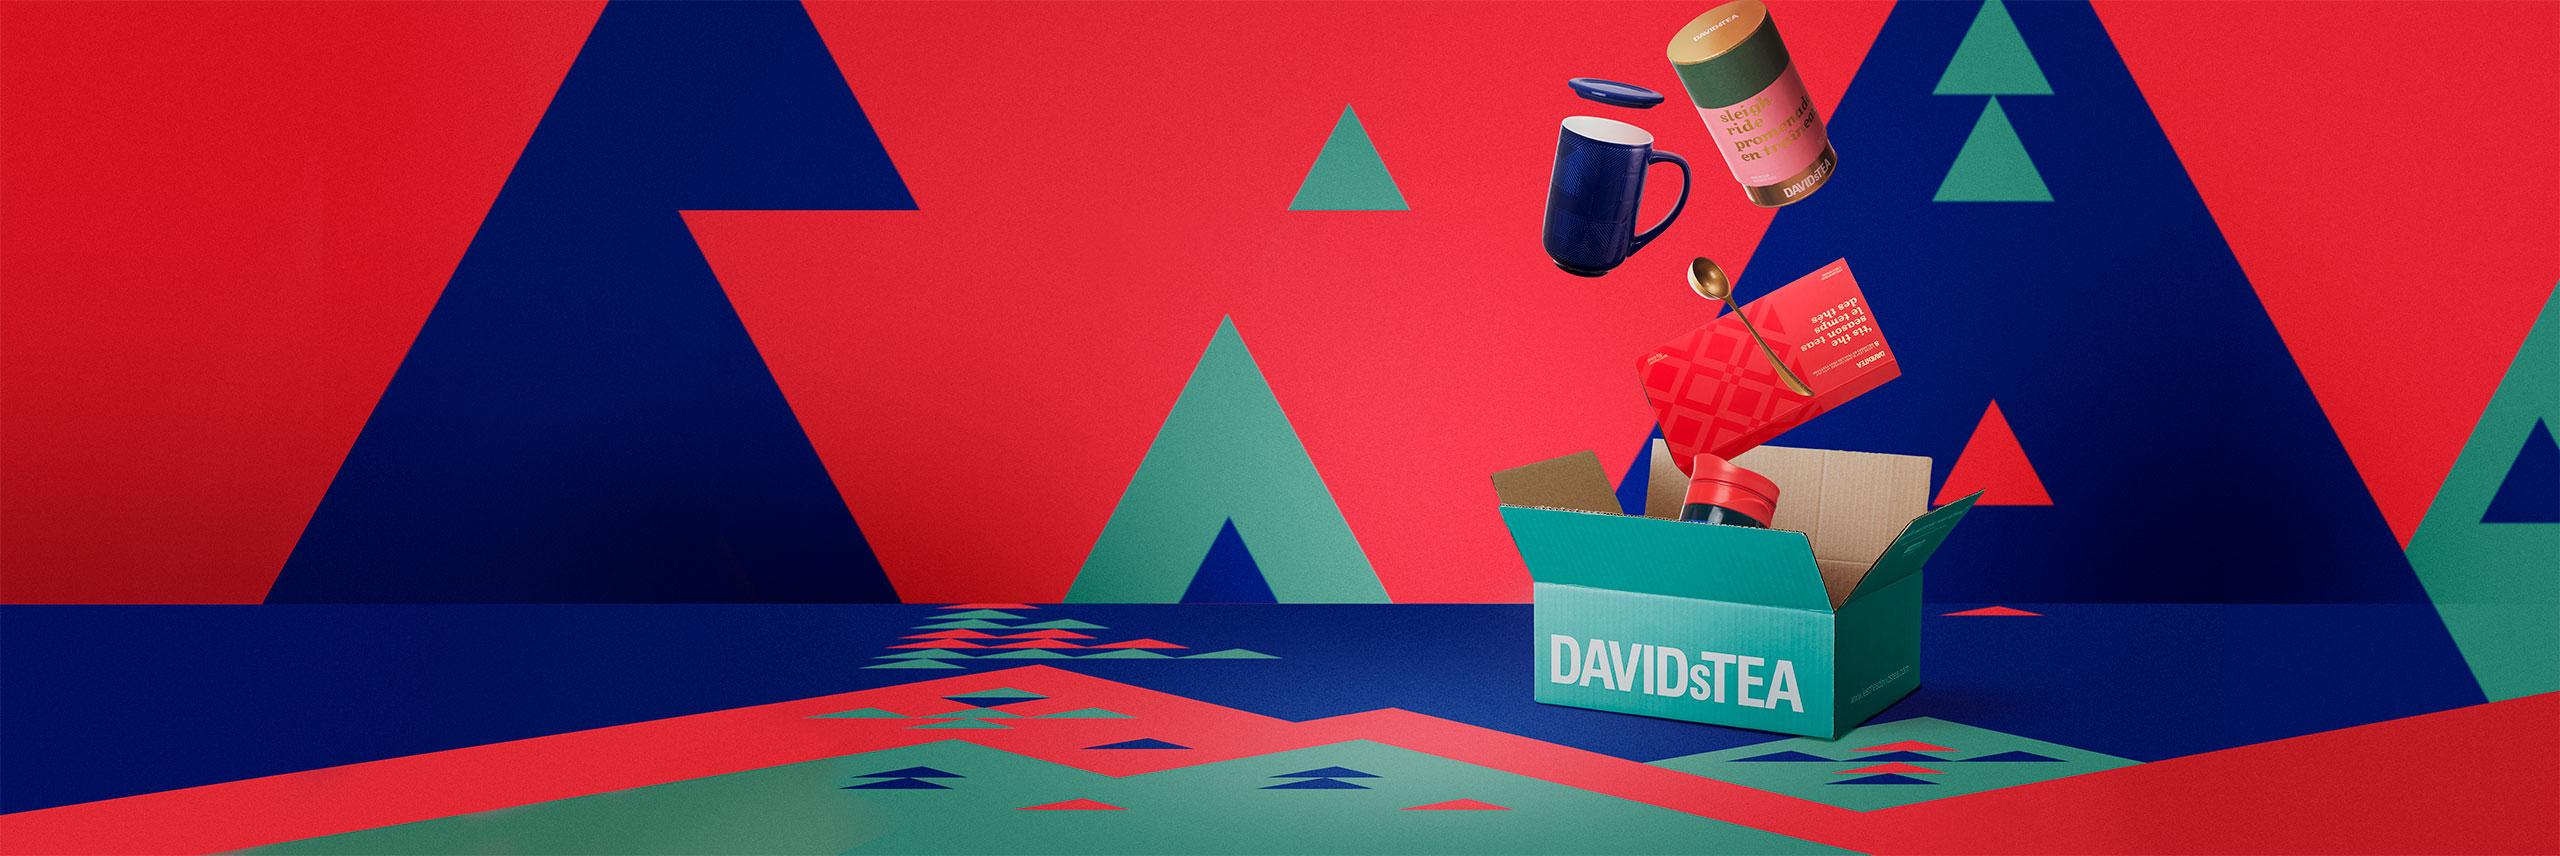 DAVIDsTEA - Buy Loose Leaf Tea Online